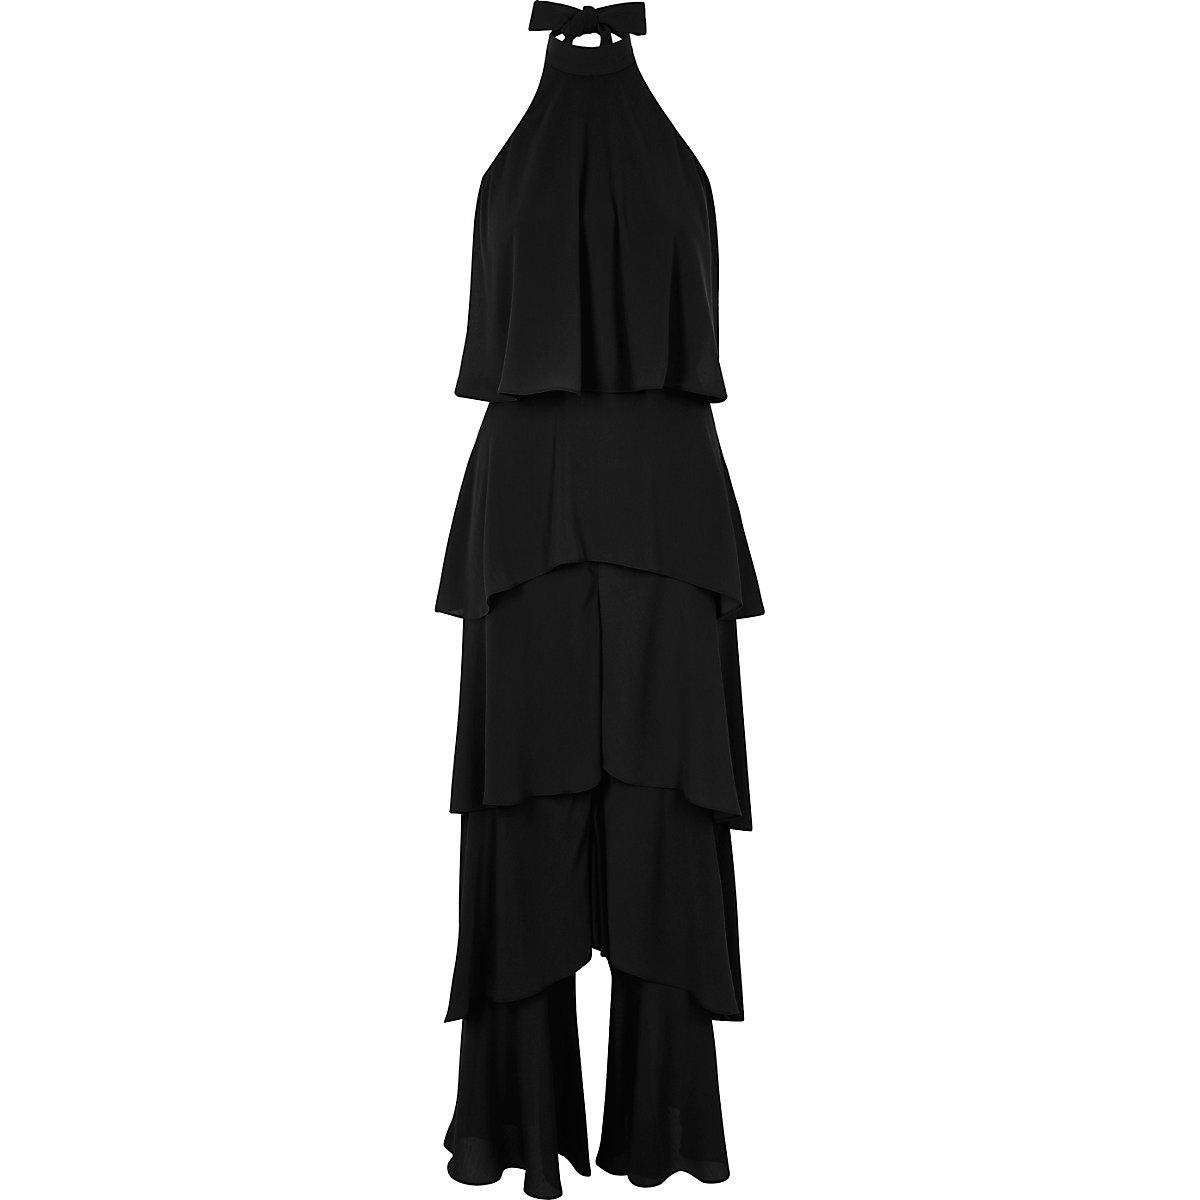 Black wide leg halter frill jumpsuit